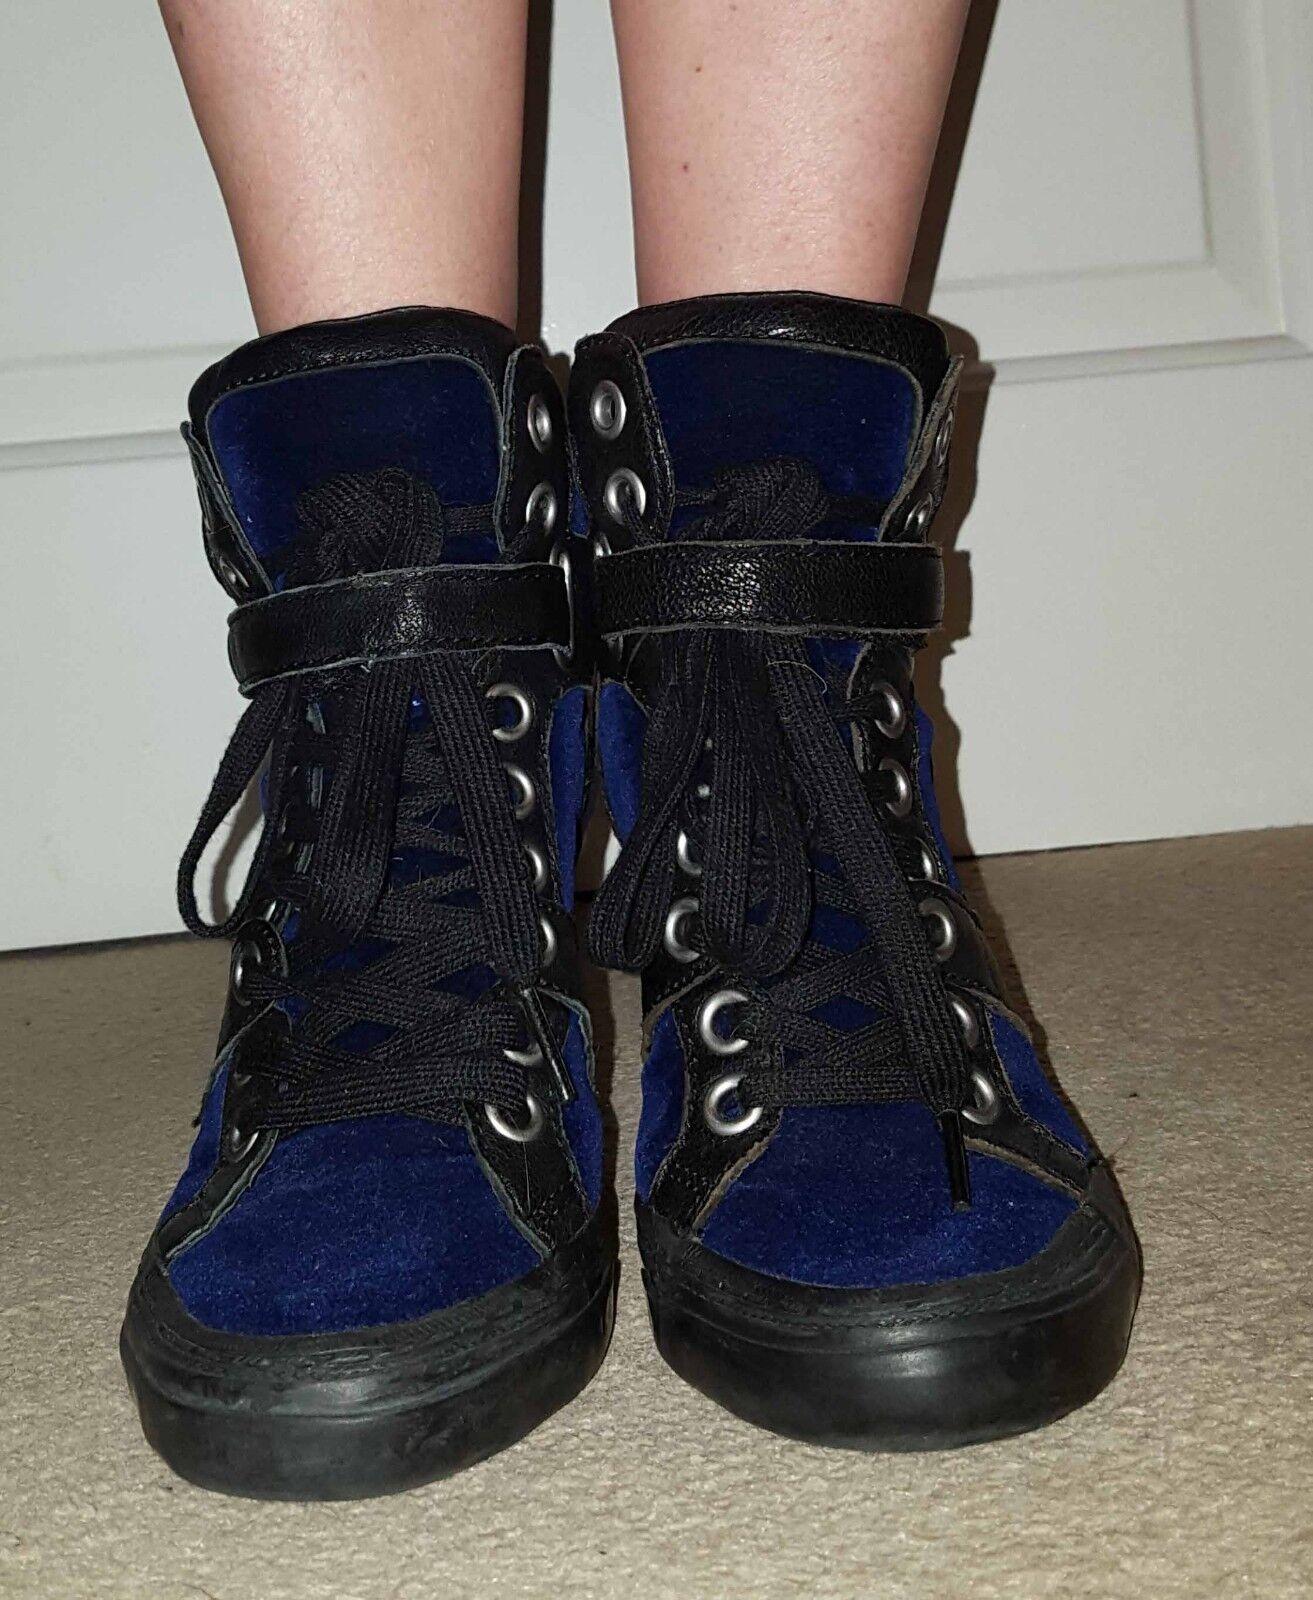 ASH NAVY VELVET Schuhe SIZE UK4 EU37